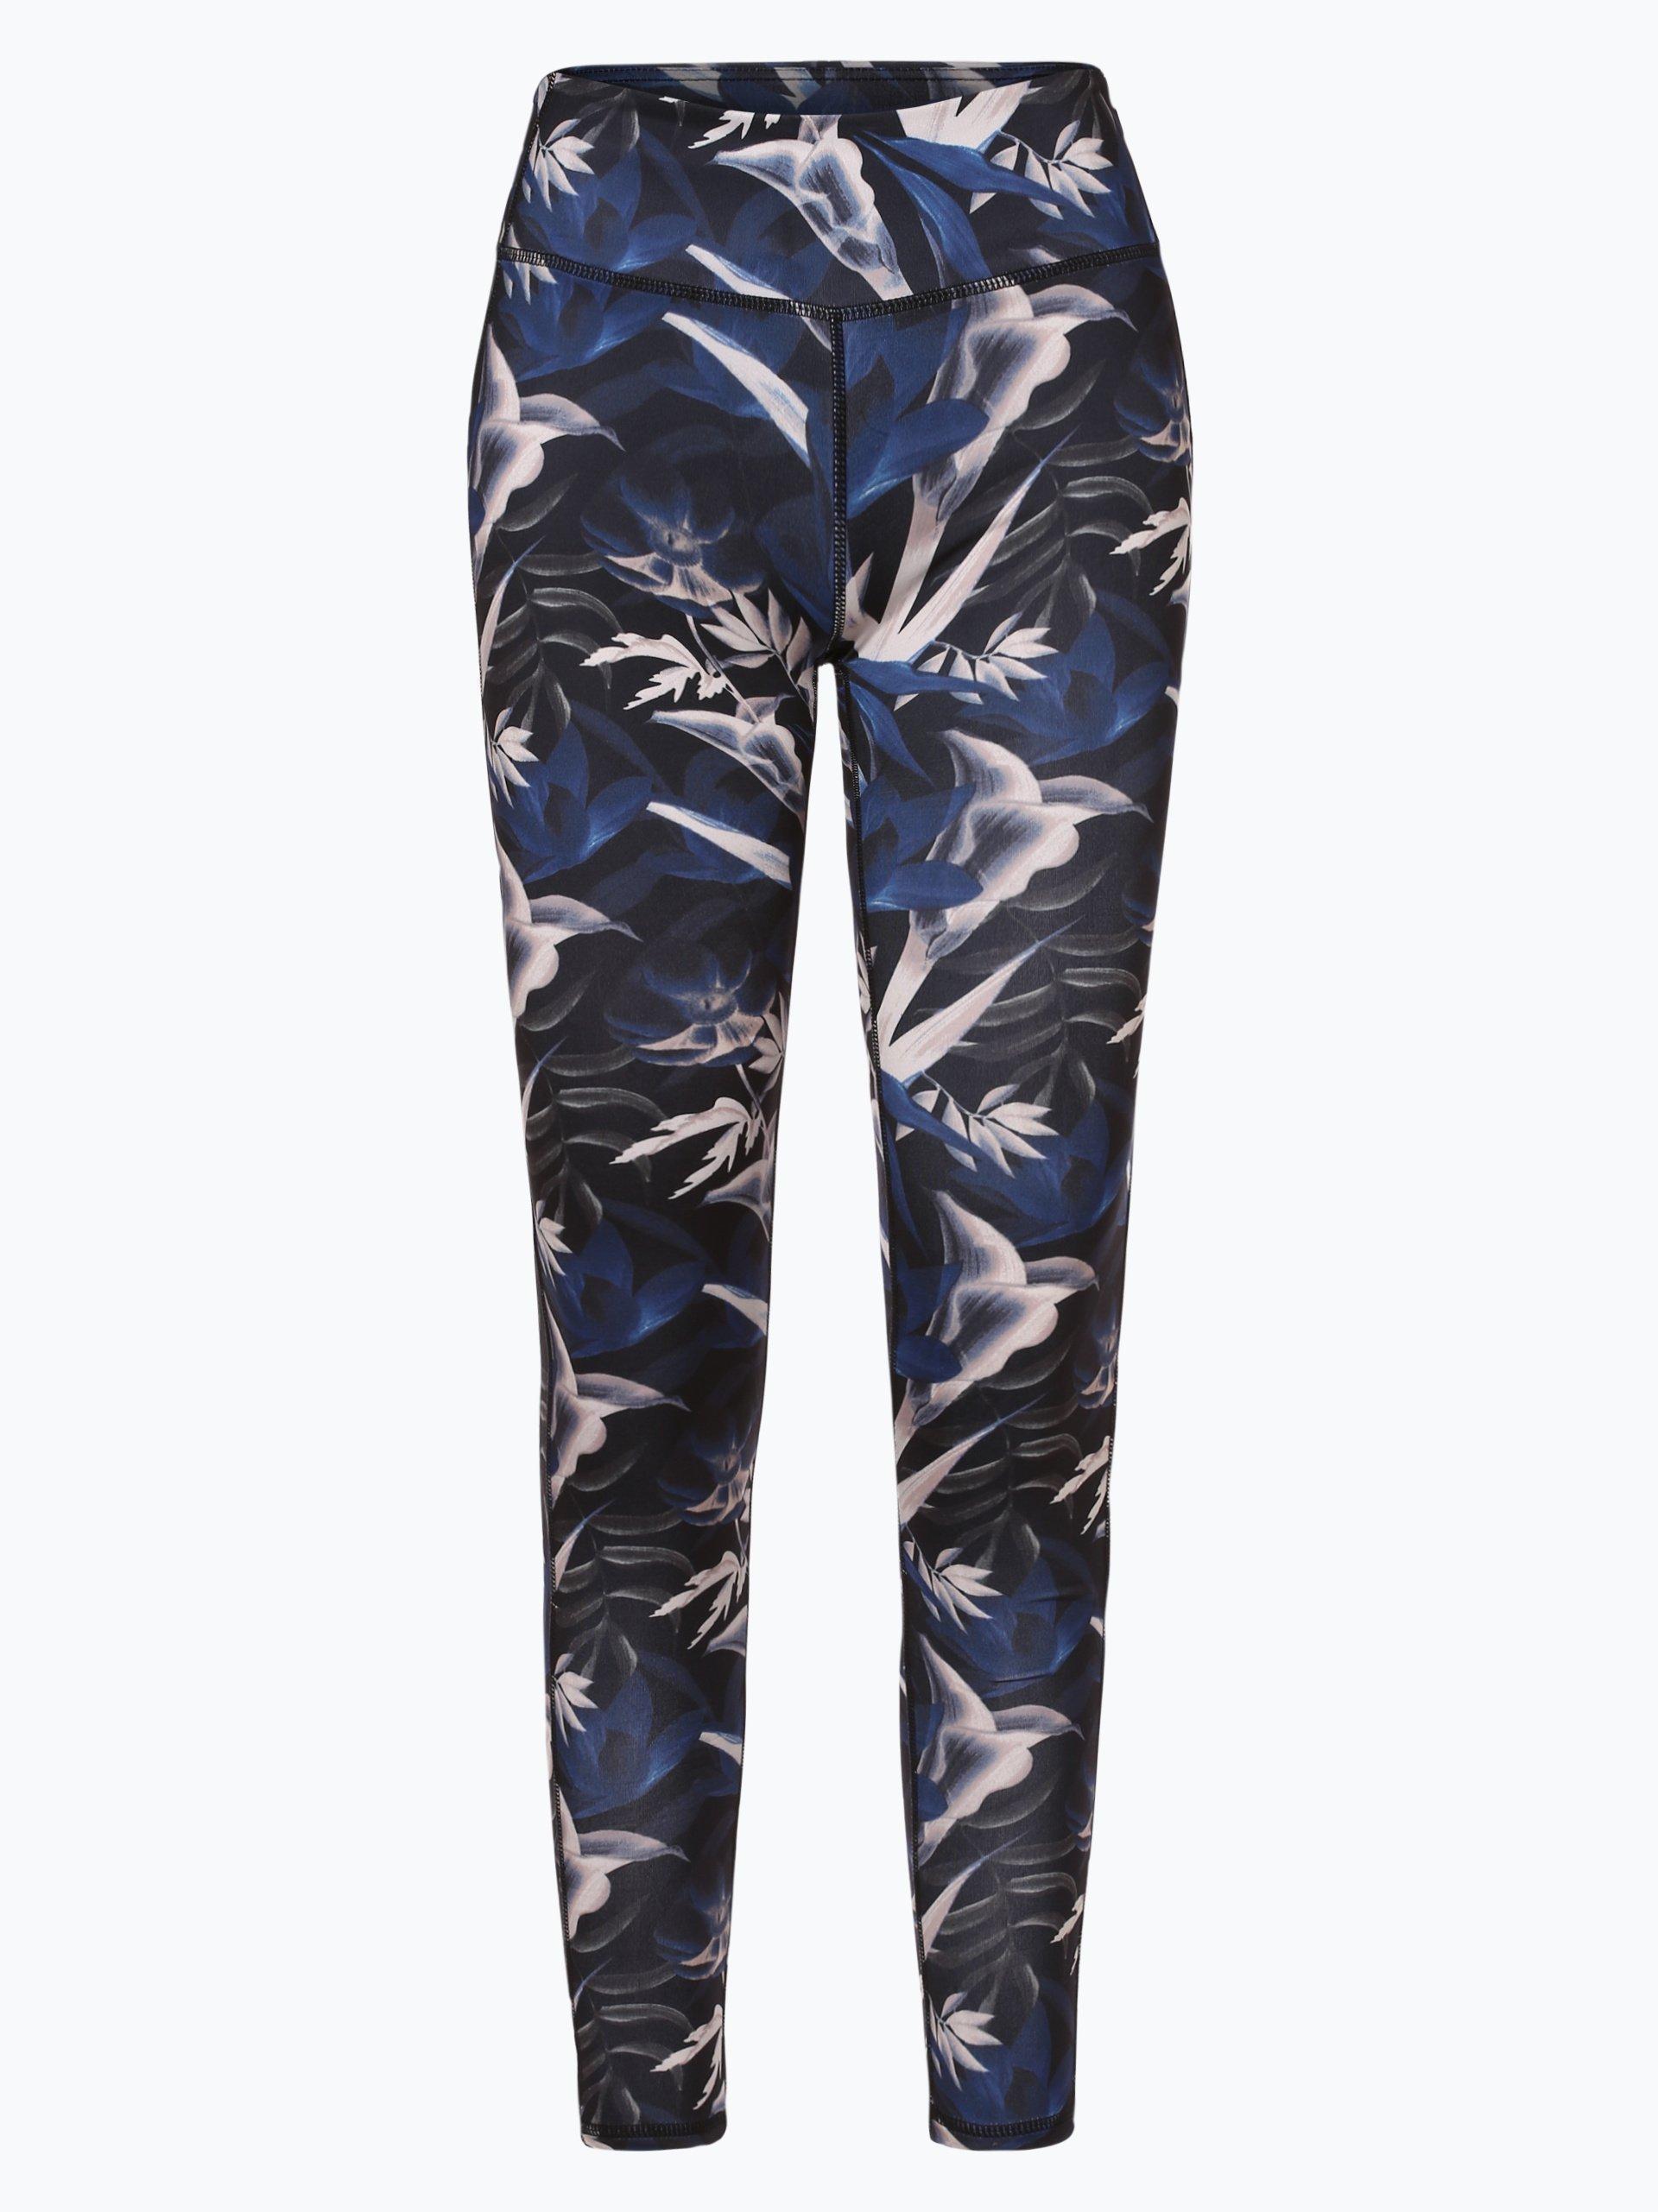 marie lund sport damen sportswear leggings online kaufen. Black Bedroom Furniture Sets. Home Design Ideas